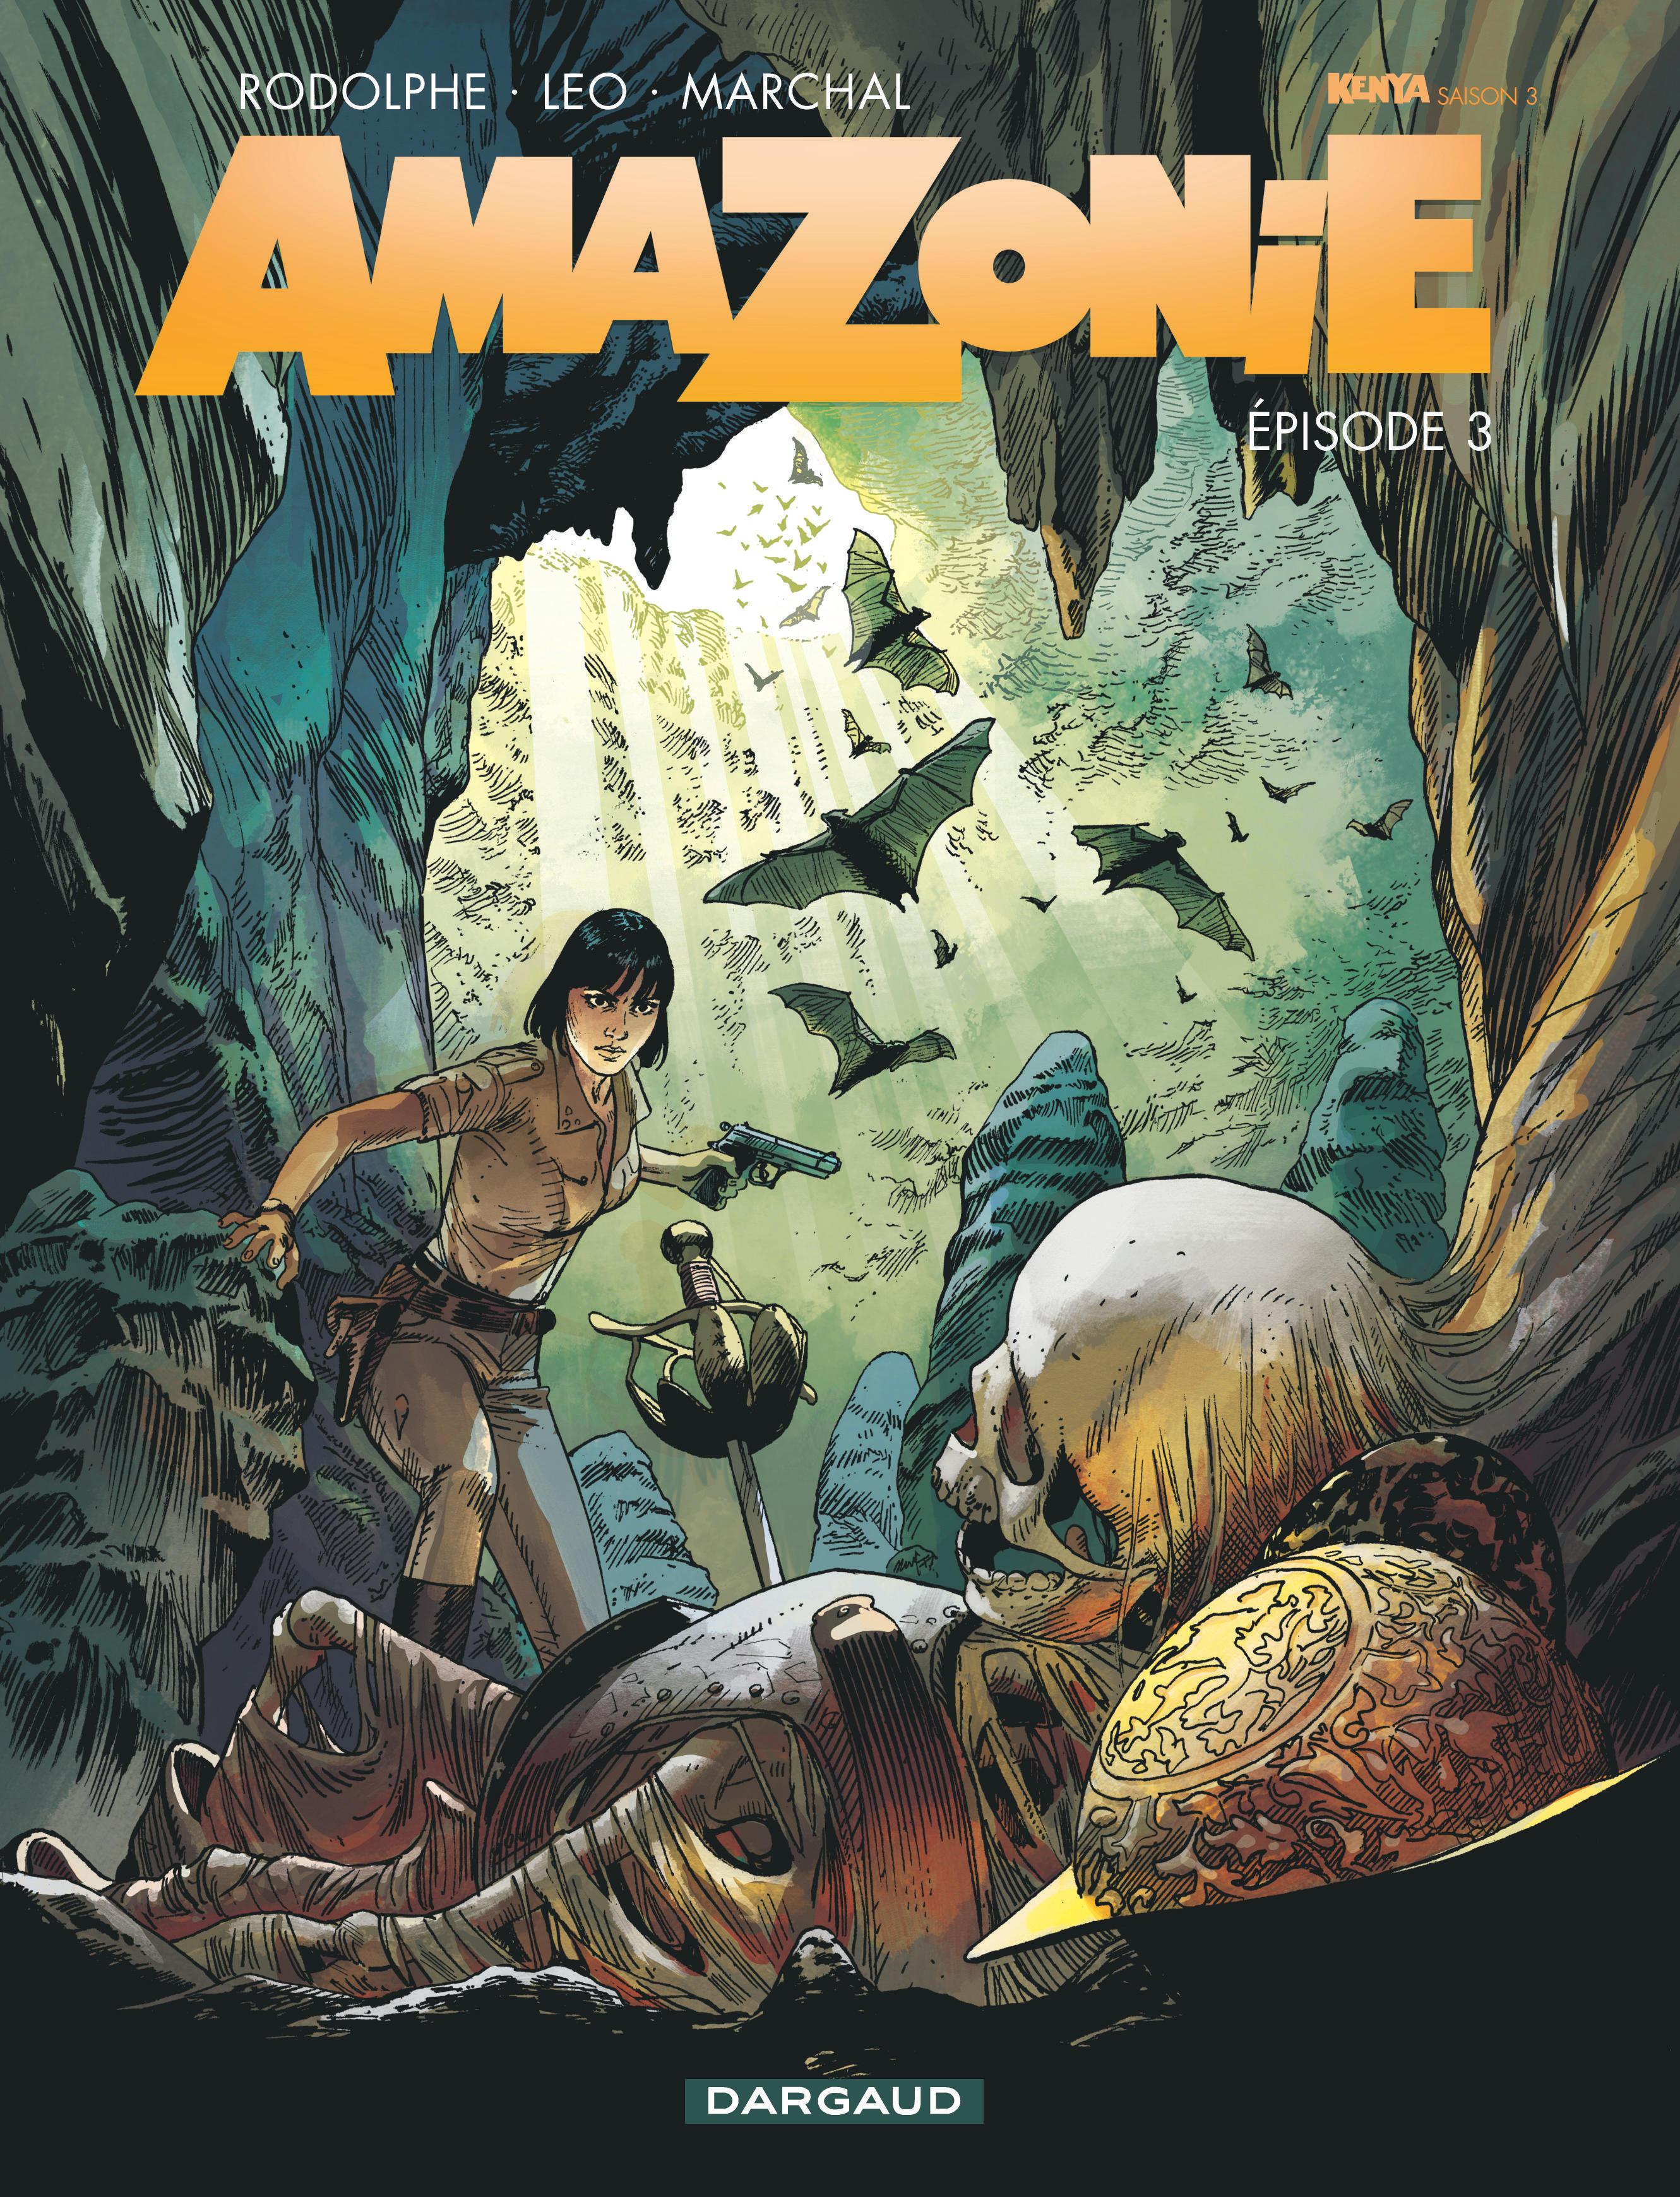 AMAZONIE T3 AMAZONIE TOME 3 - AMAZONIE - TOME 3